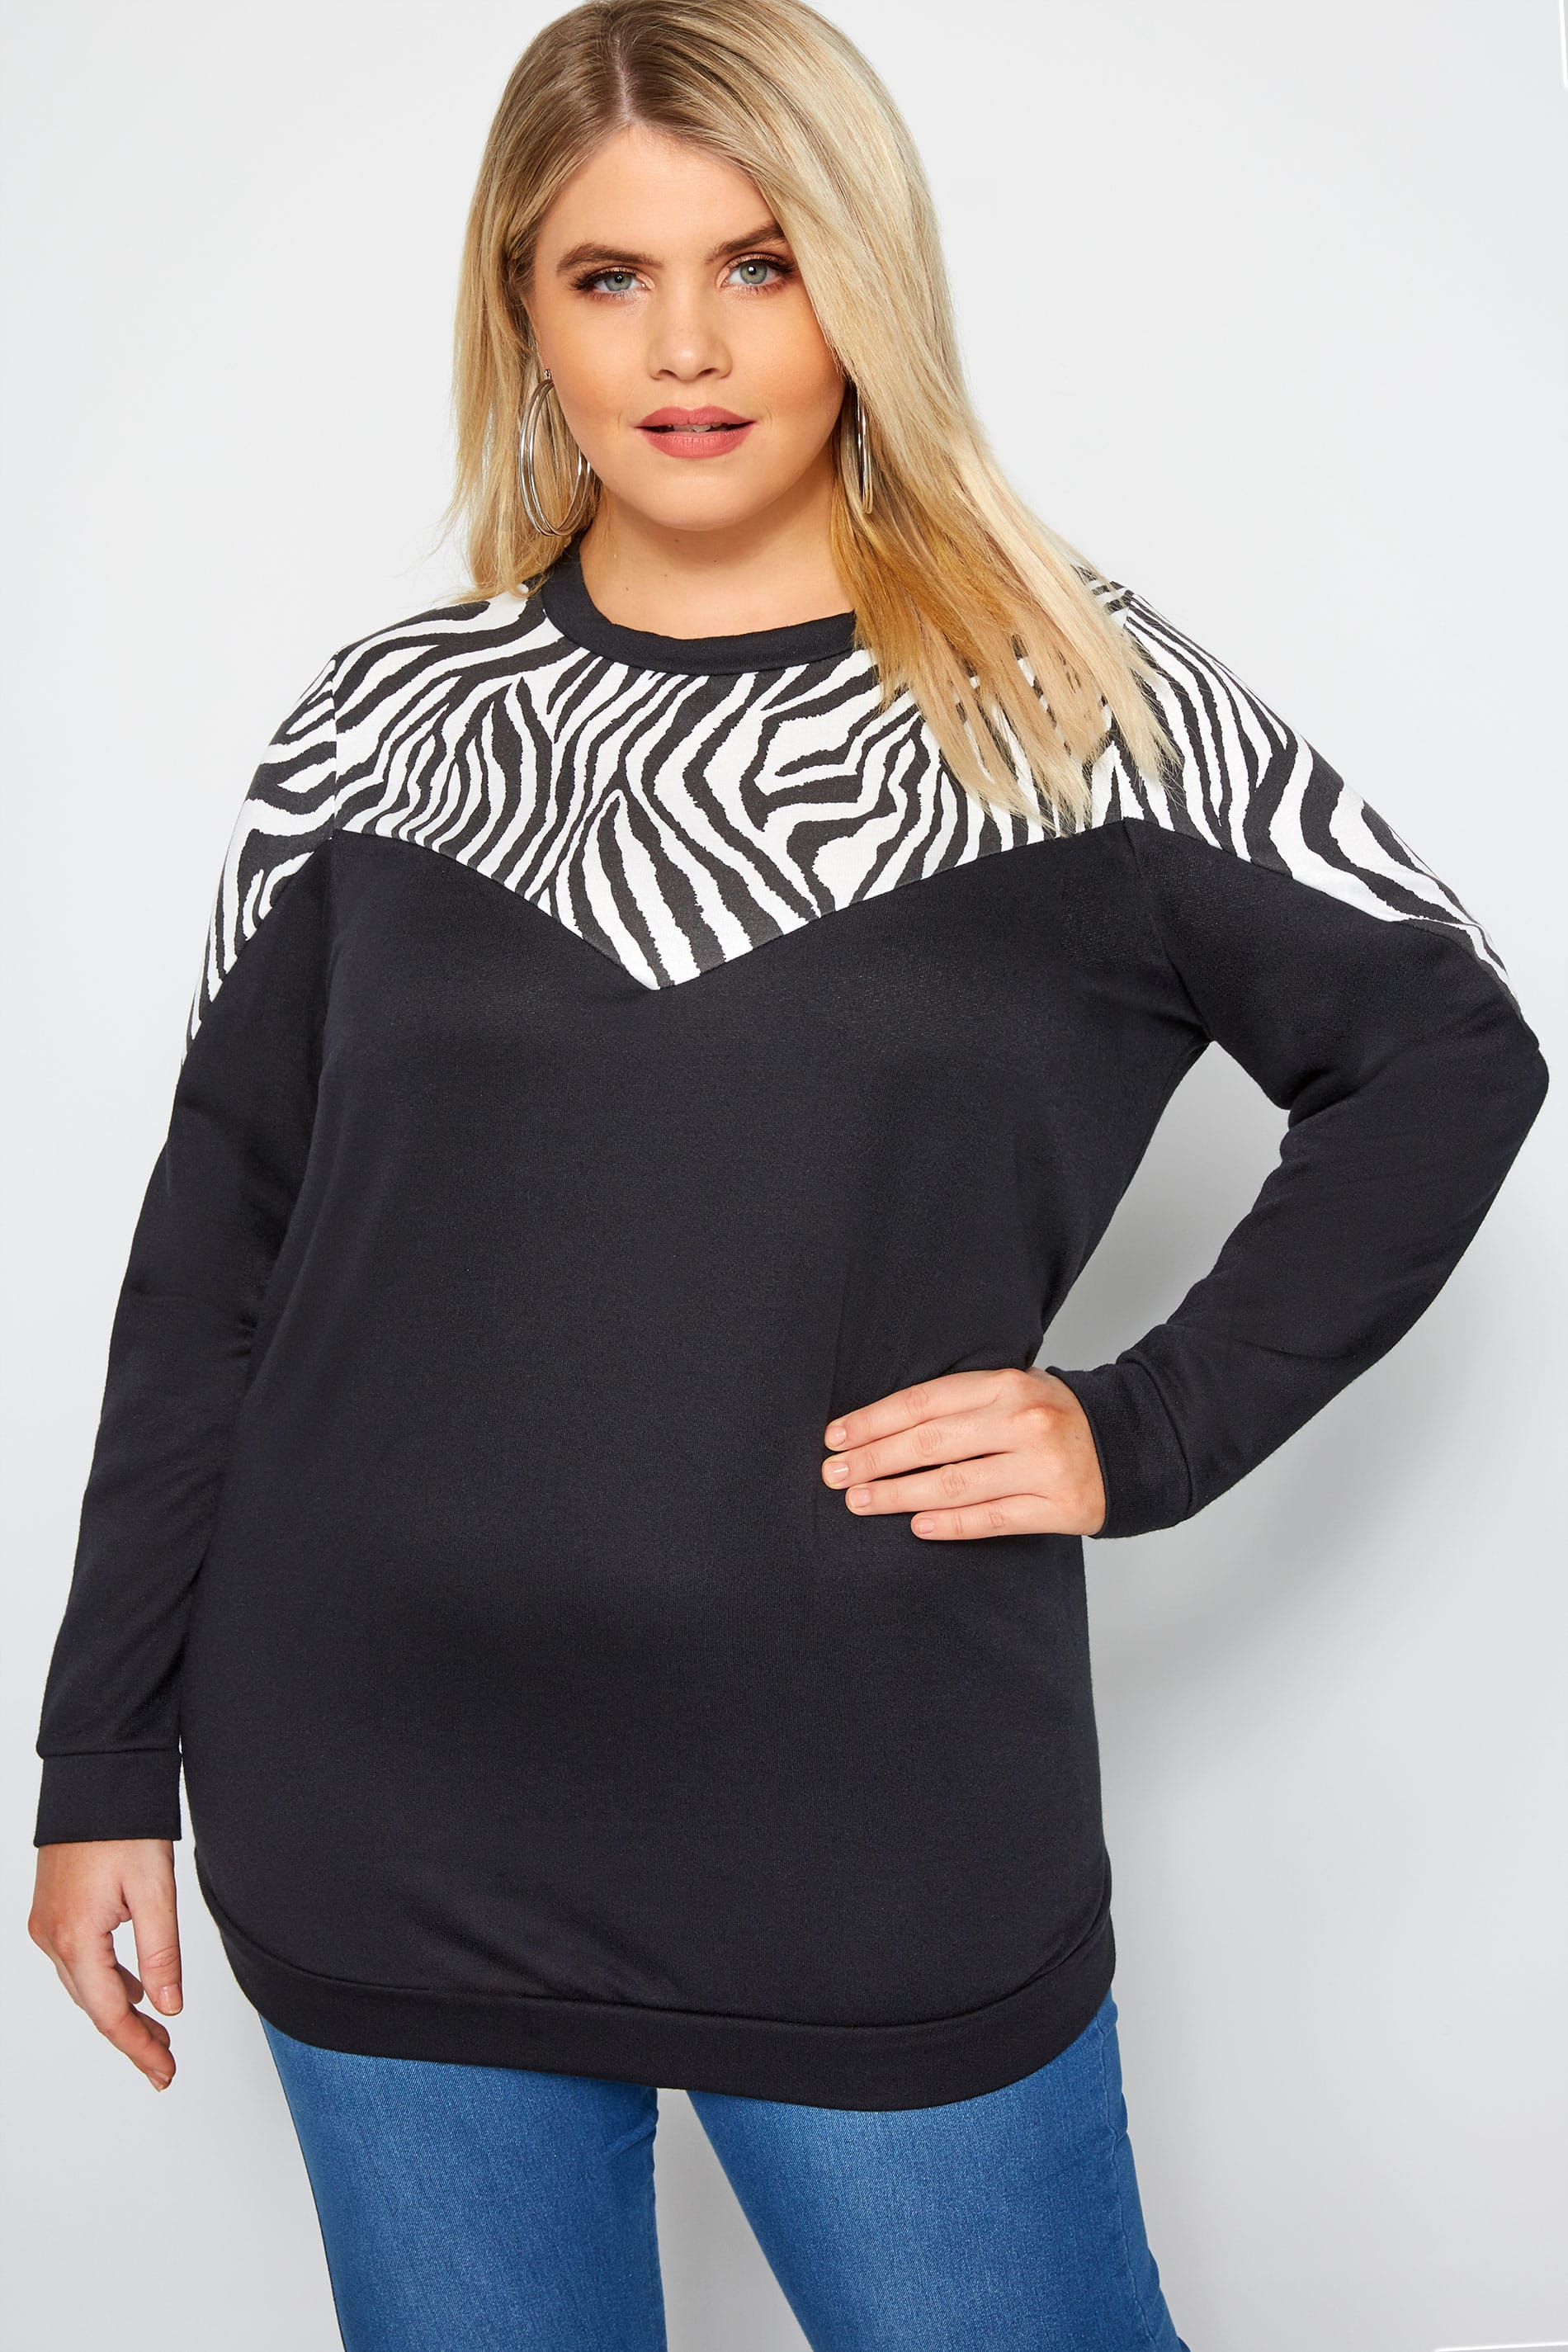 Black Zebra Chevron Sweatshirt